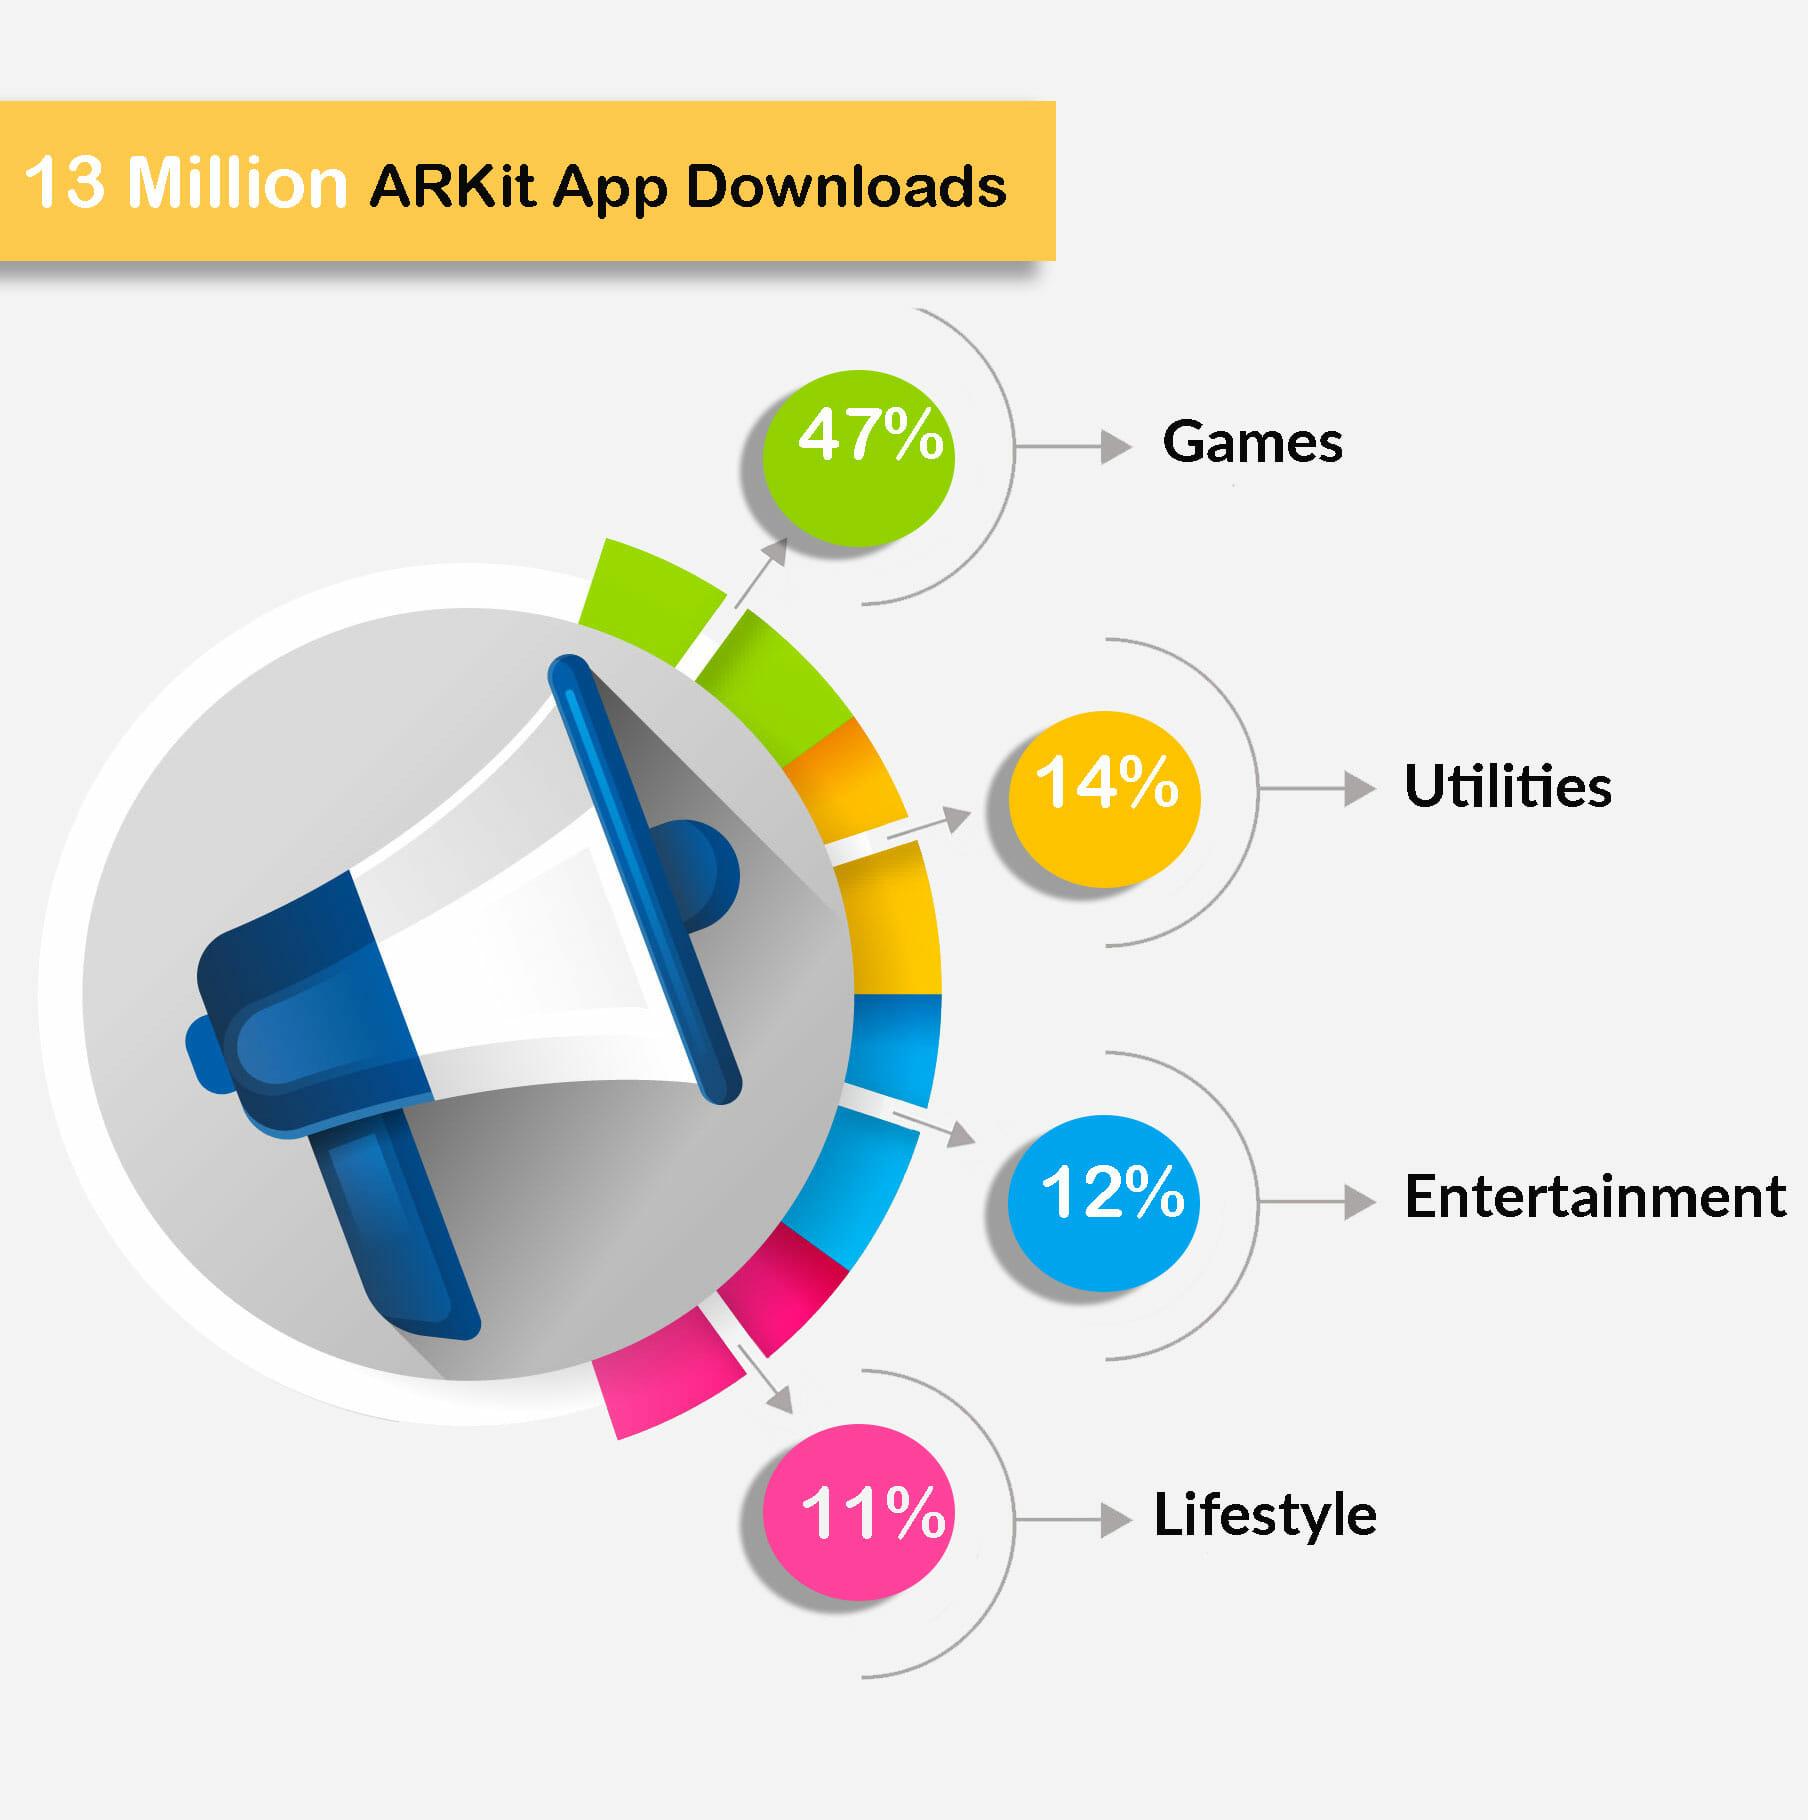 arkit-app-downloads-for-ar